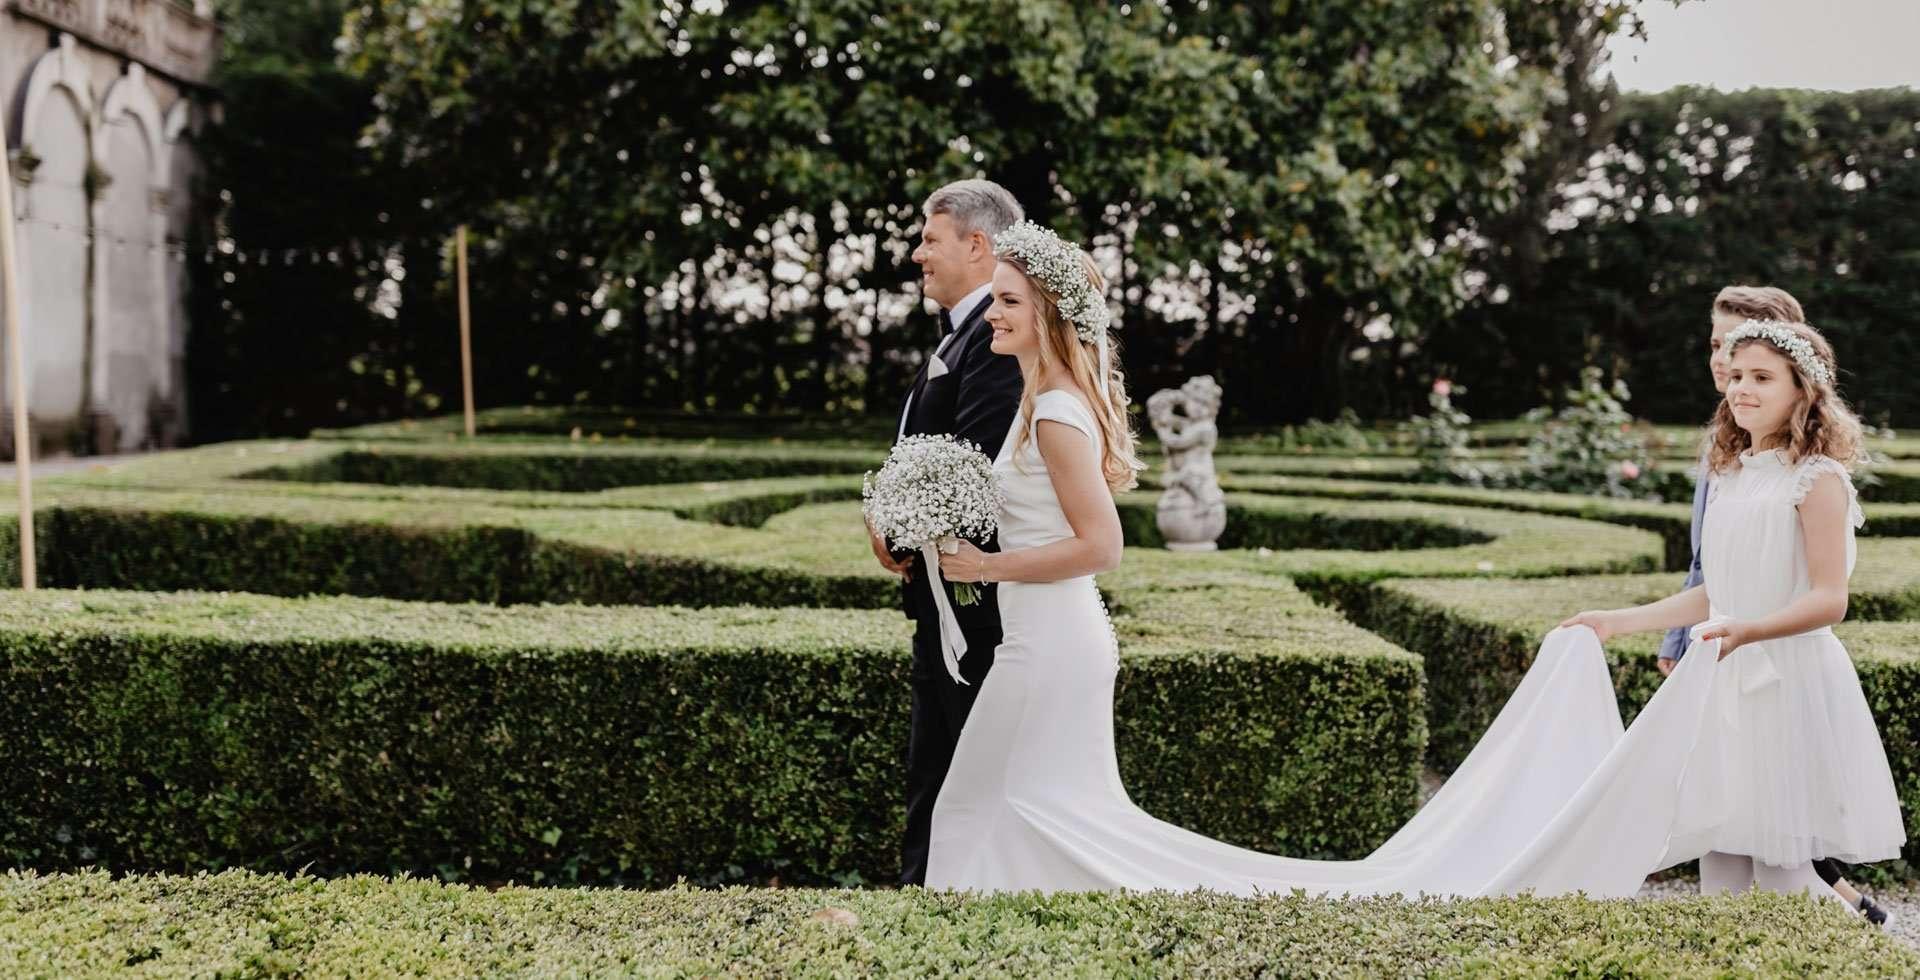 Destination wedding in villa veneta a Verona